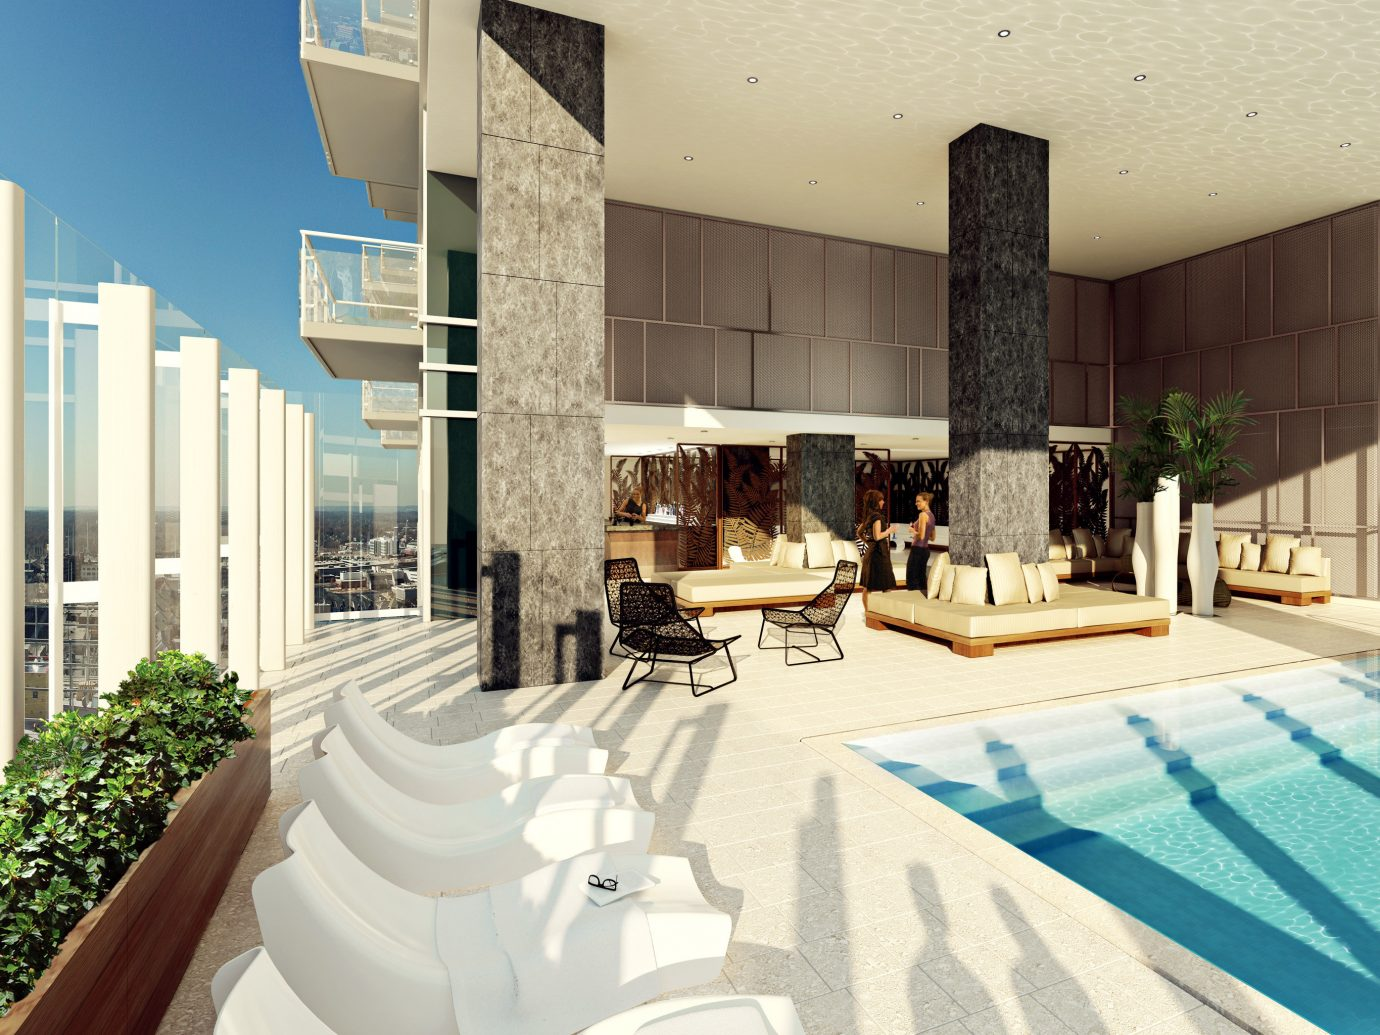 Food + Drink Lounge Luxury Modern Pool property room condominium swimming pool estate home interior design Design Villa real estate mansion apartment area furniture